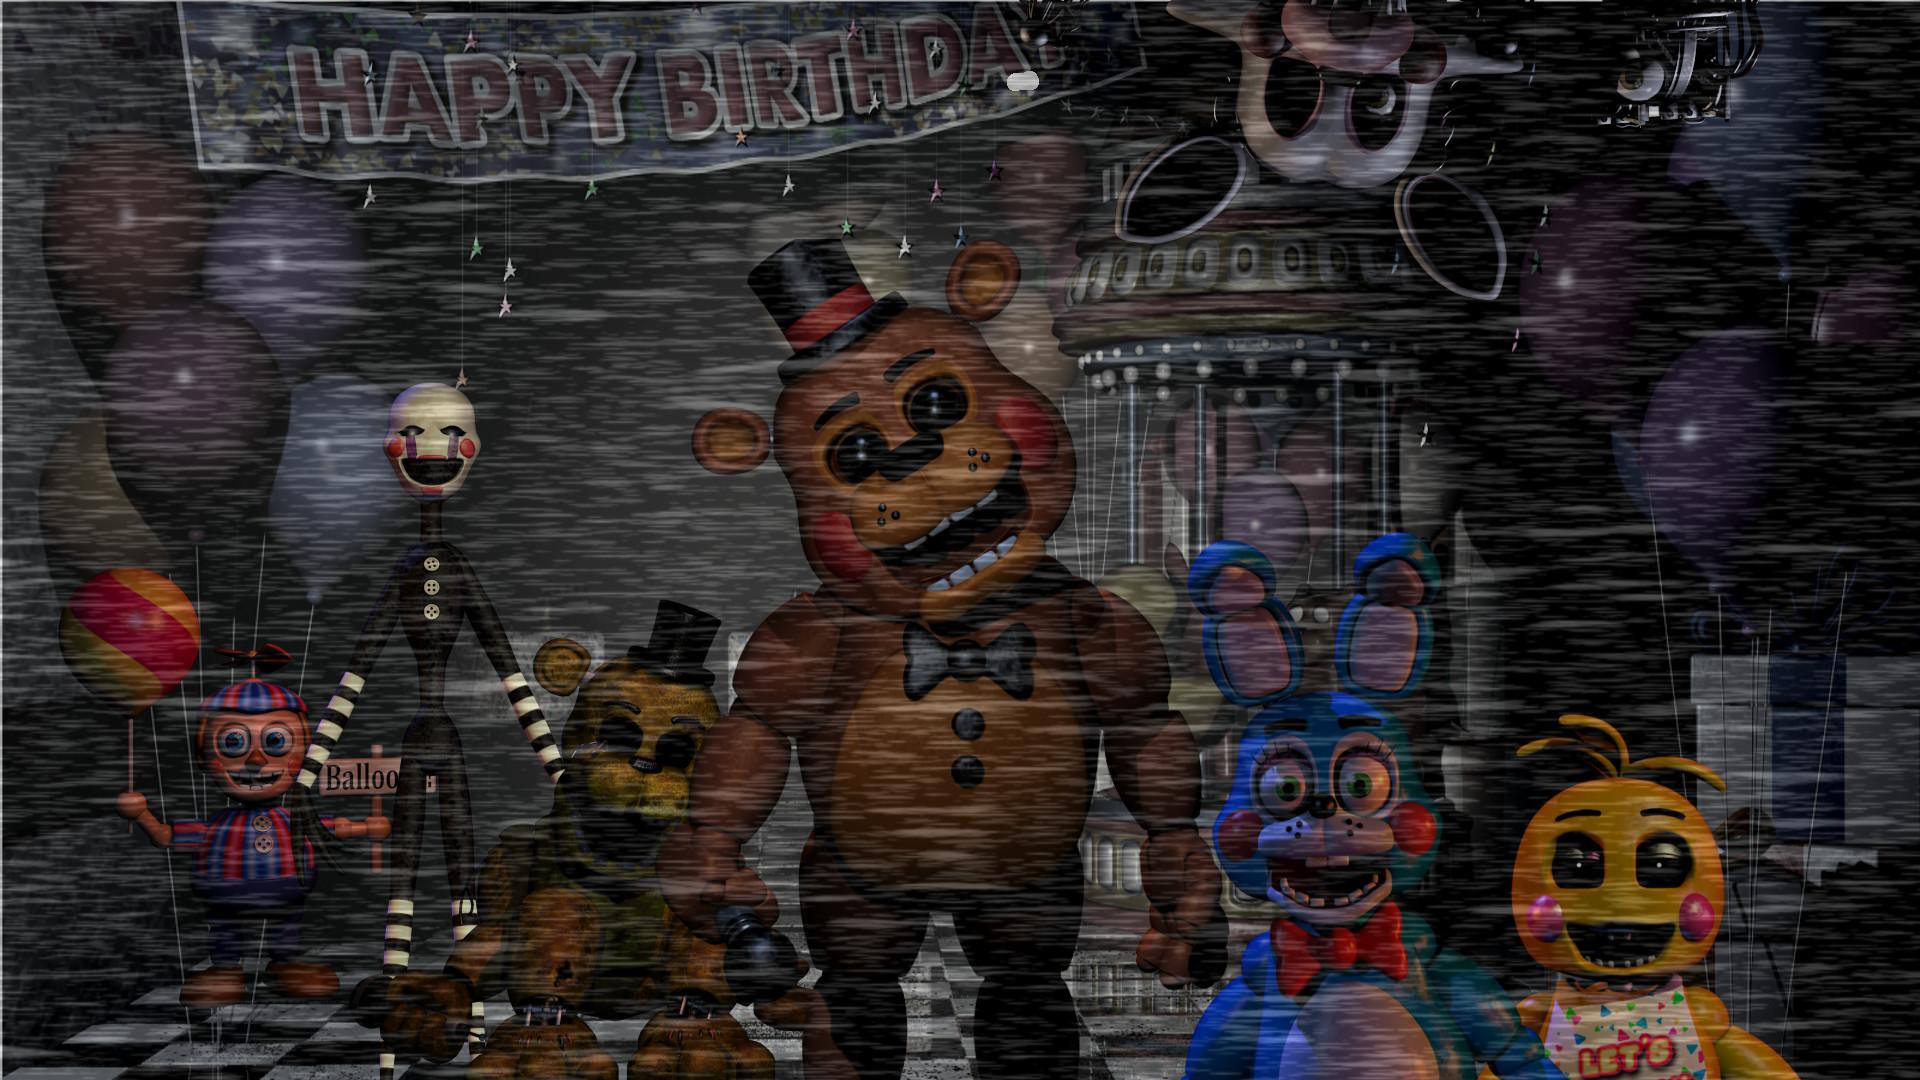 Five Nights at Freddy's 2 Wallpaper